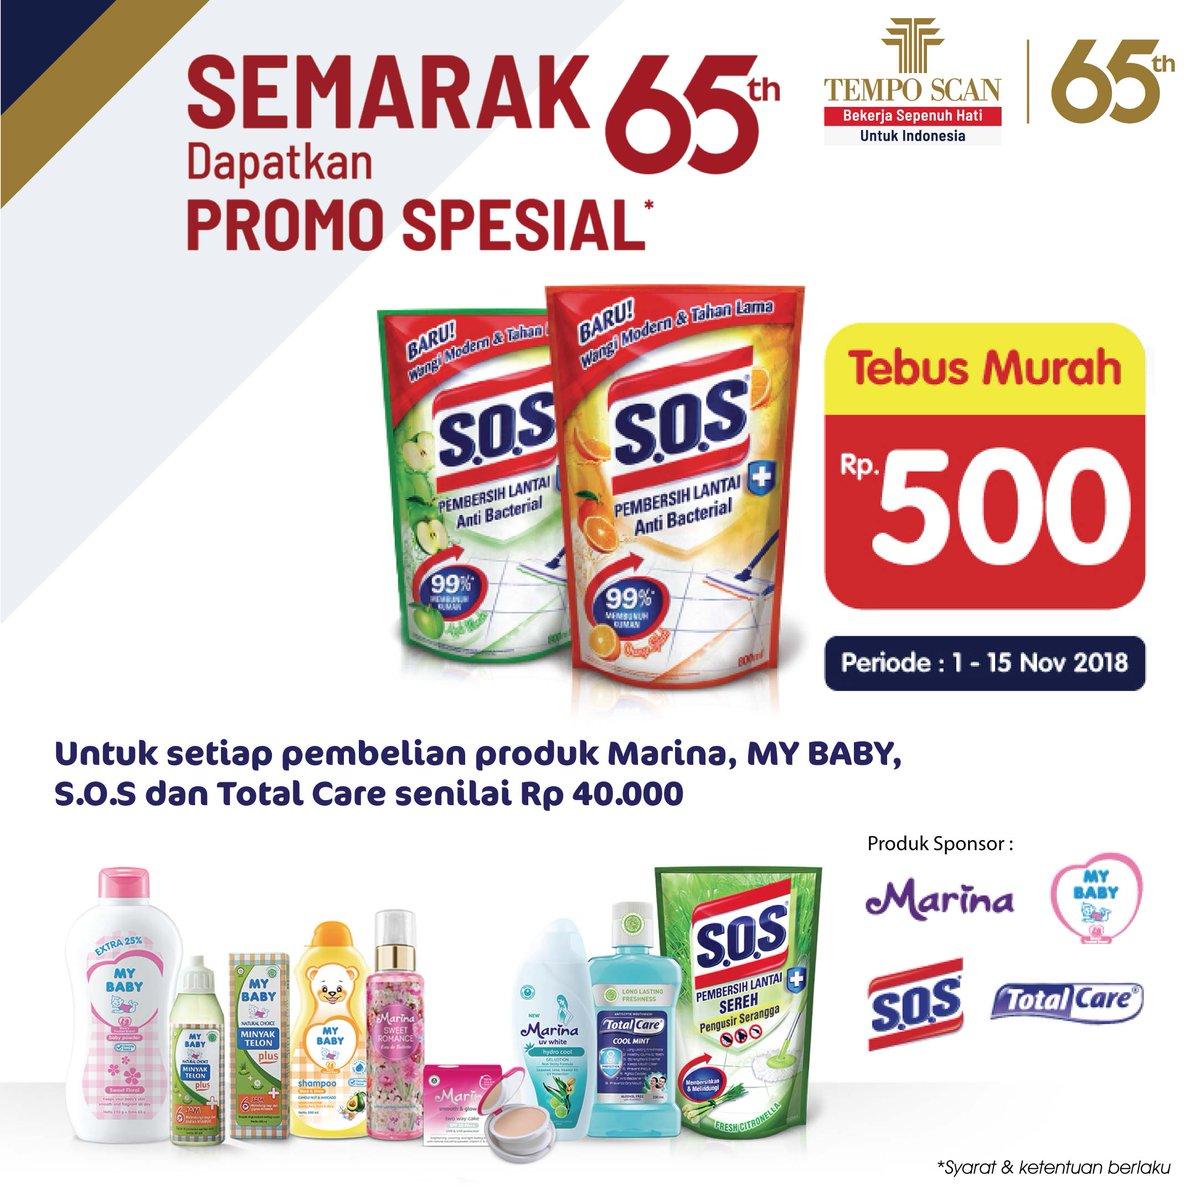 Alfamidi - Promo Semarak 65th Temp Scan Dapatkan Promo Special (s.d 15 Nov 2018)